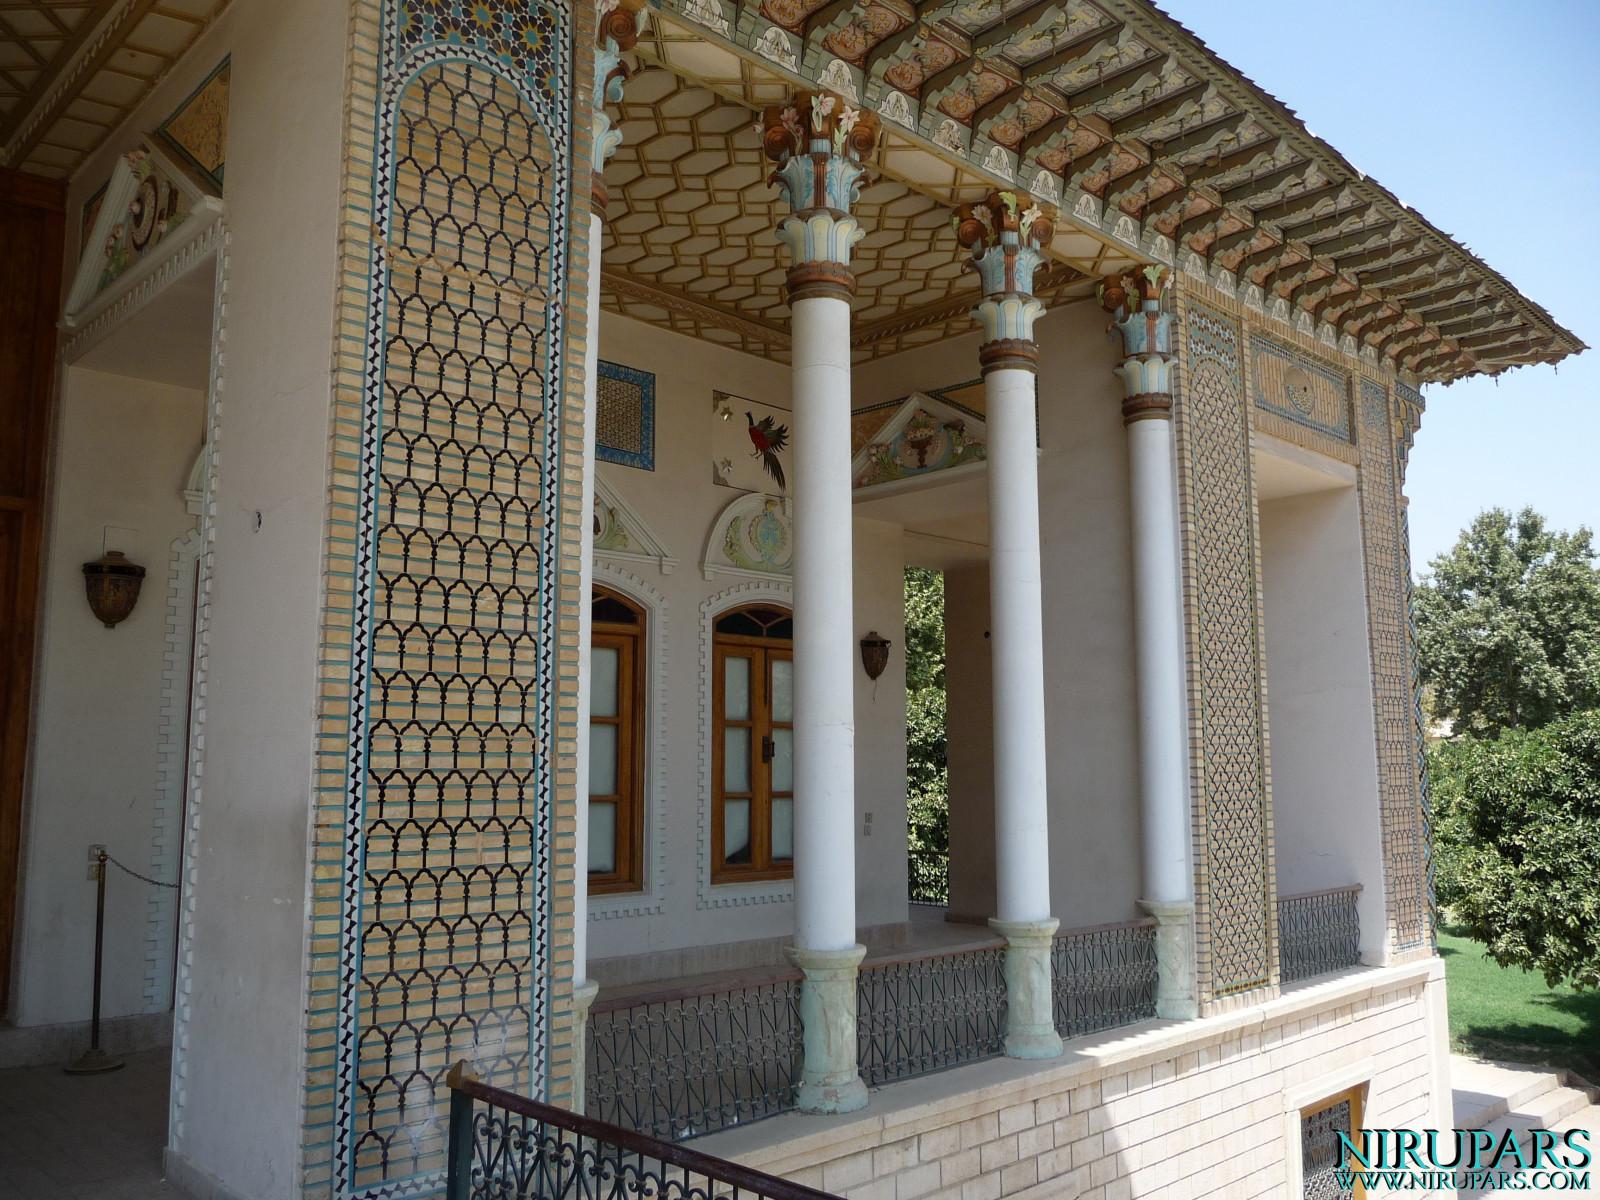 Baq-e Afifabad - Building - Front Facade - Balcony Right